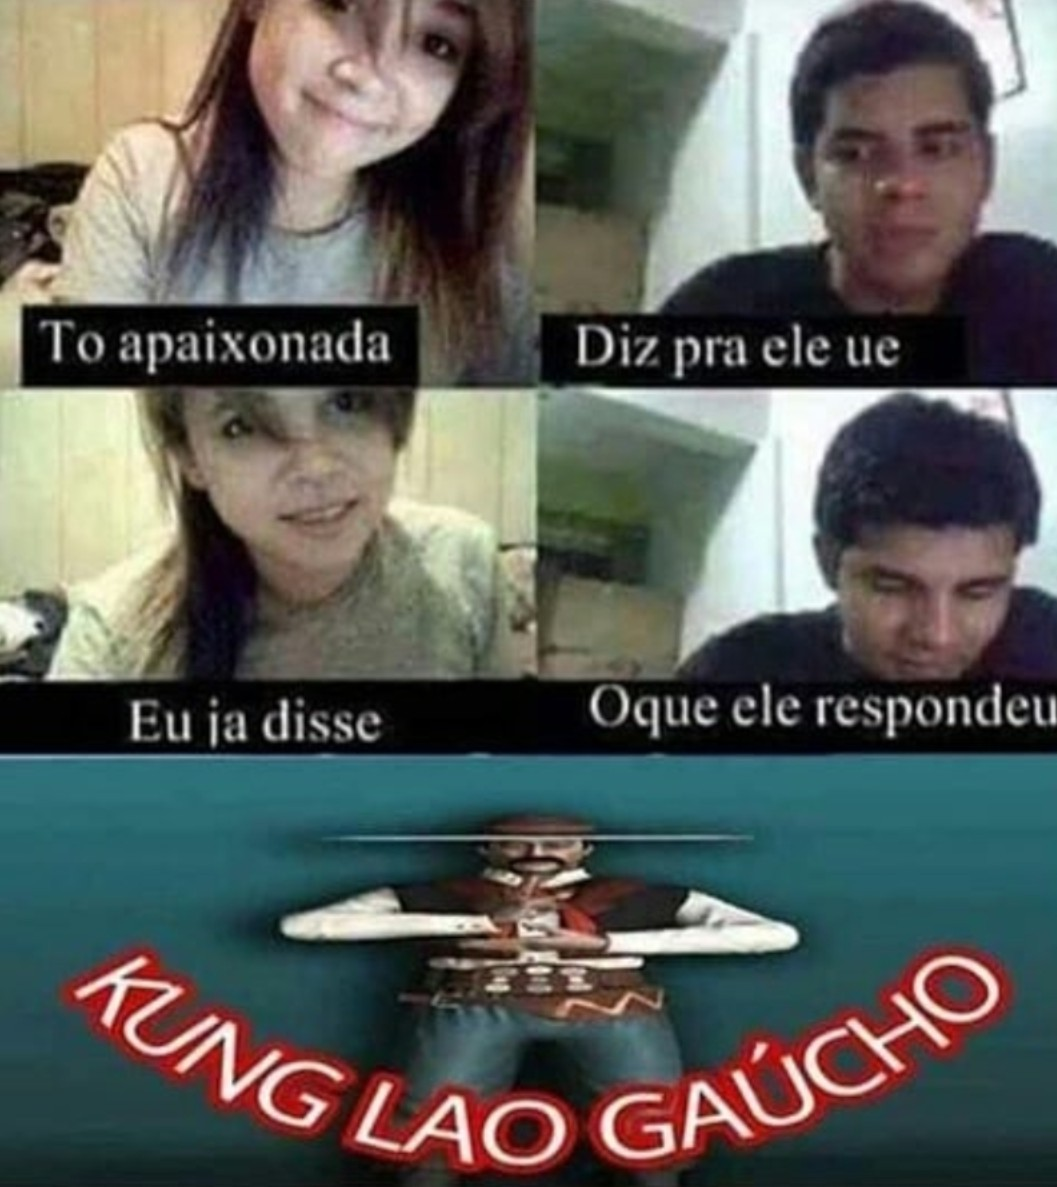 MORTAO COMBATCHÊ MEO - meme